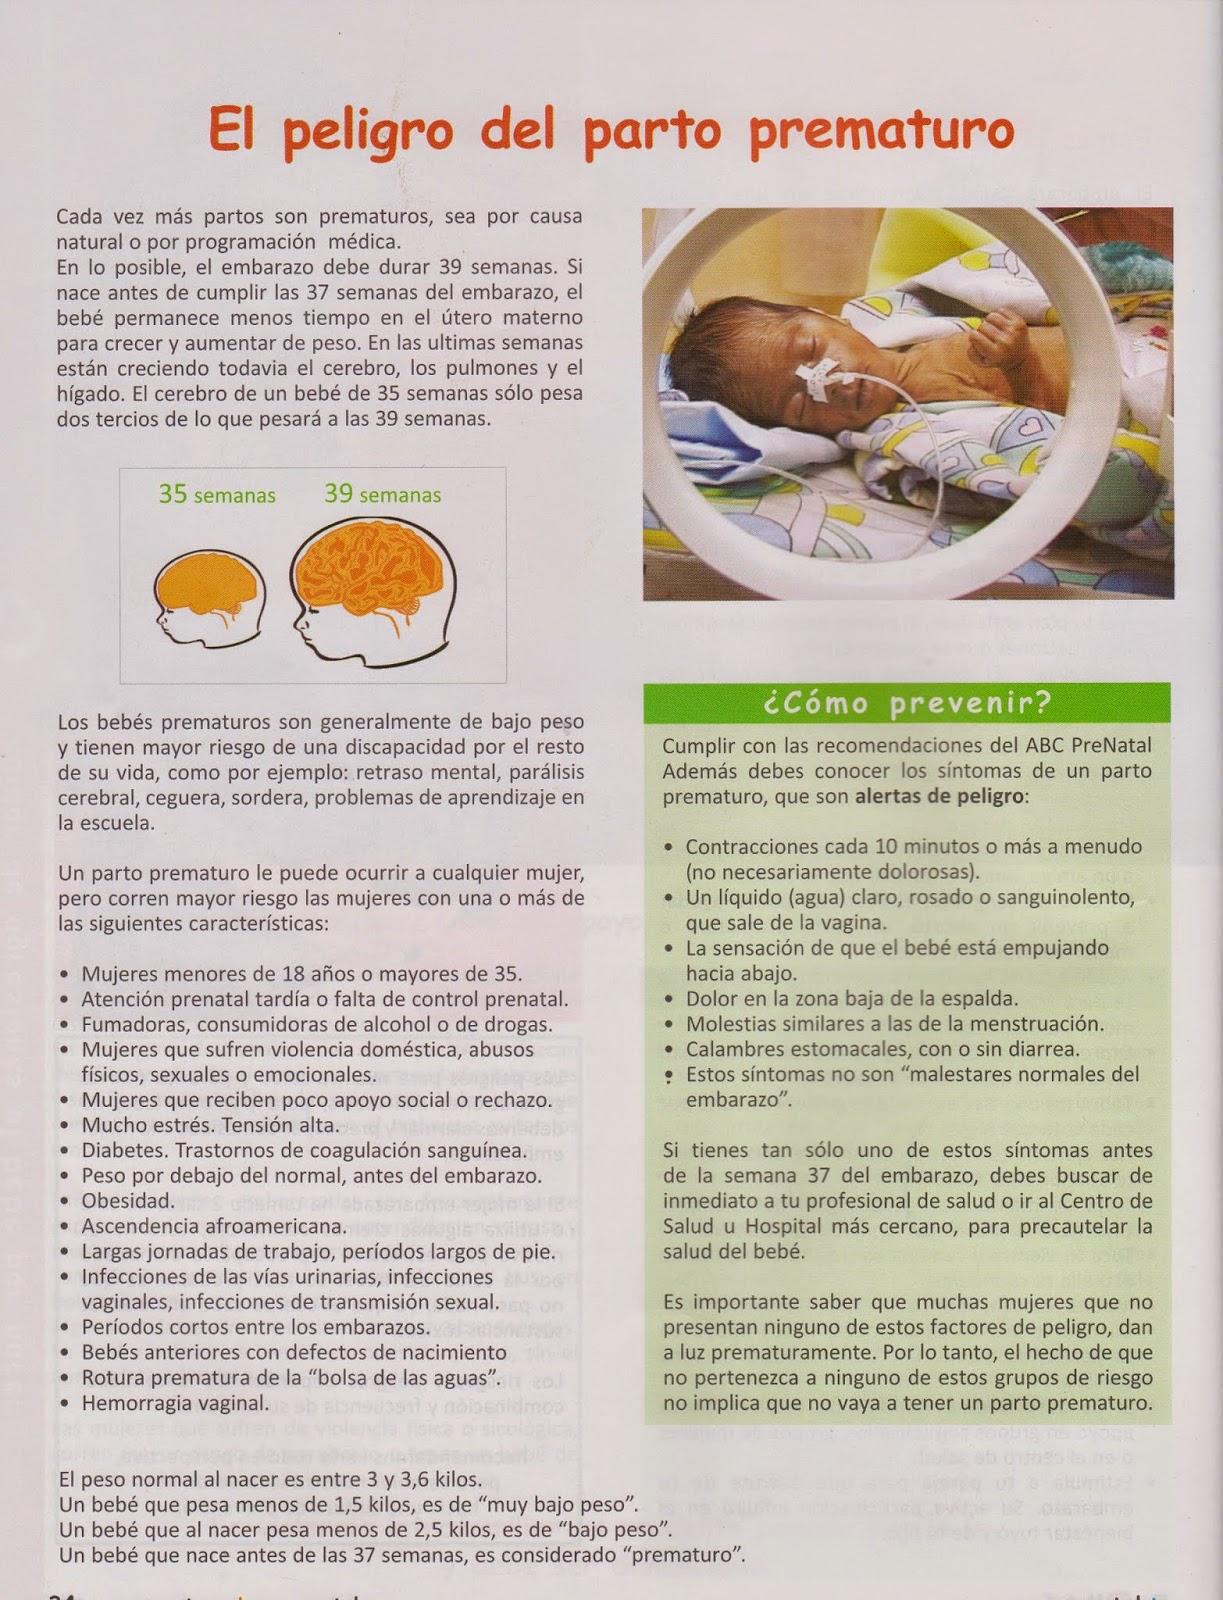 peligros del parto prematuro